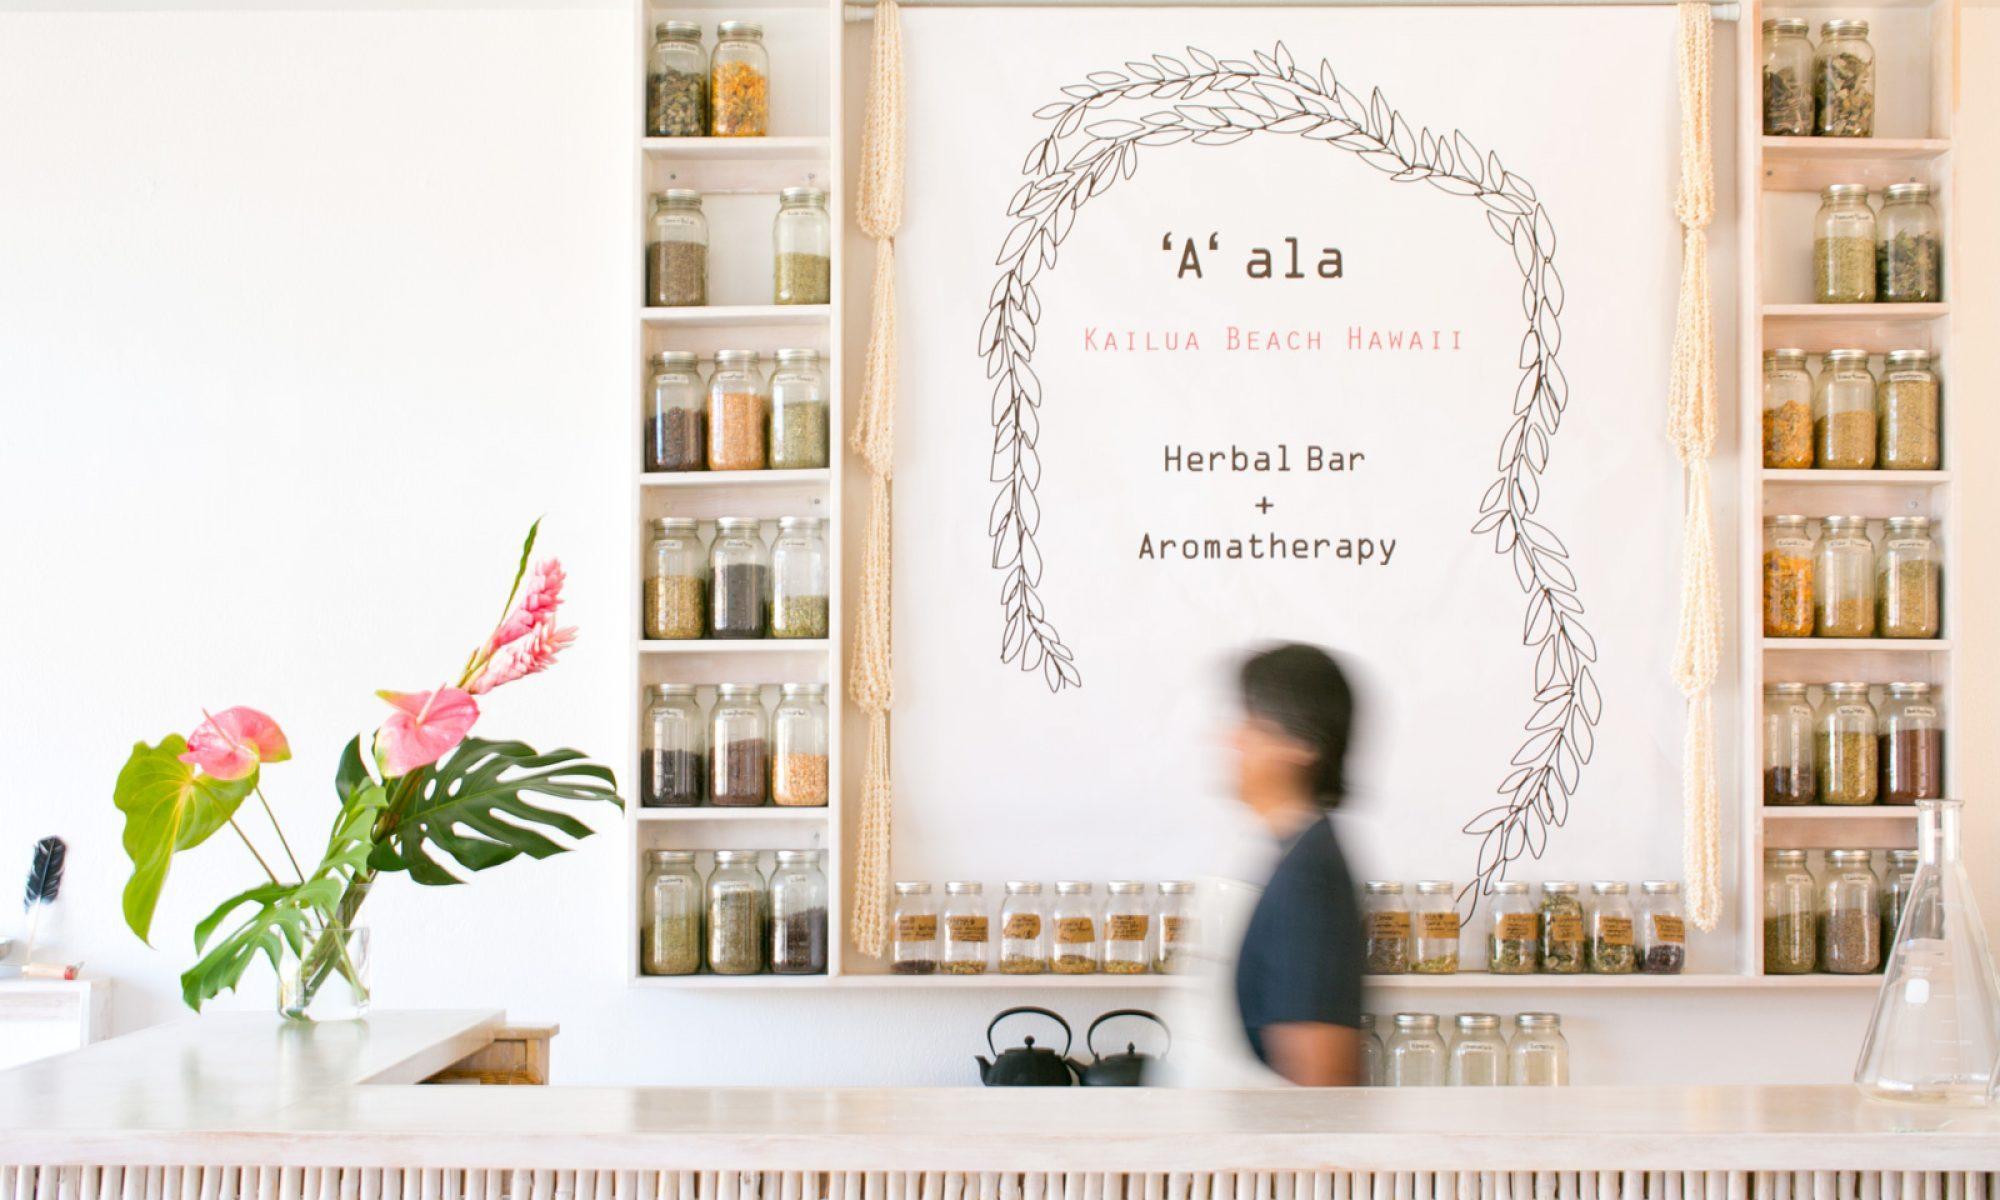 'A' ala Herbal Bar + Aromatherapy